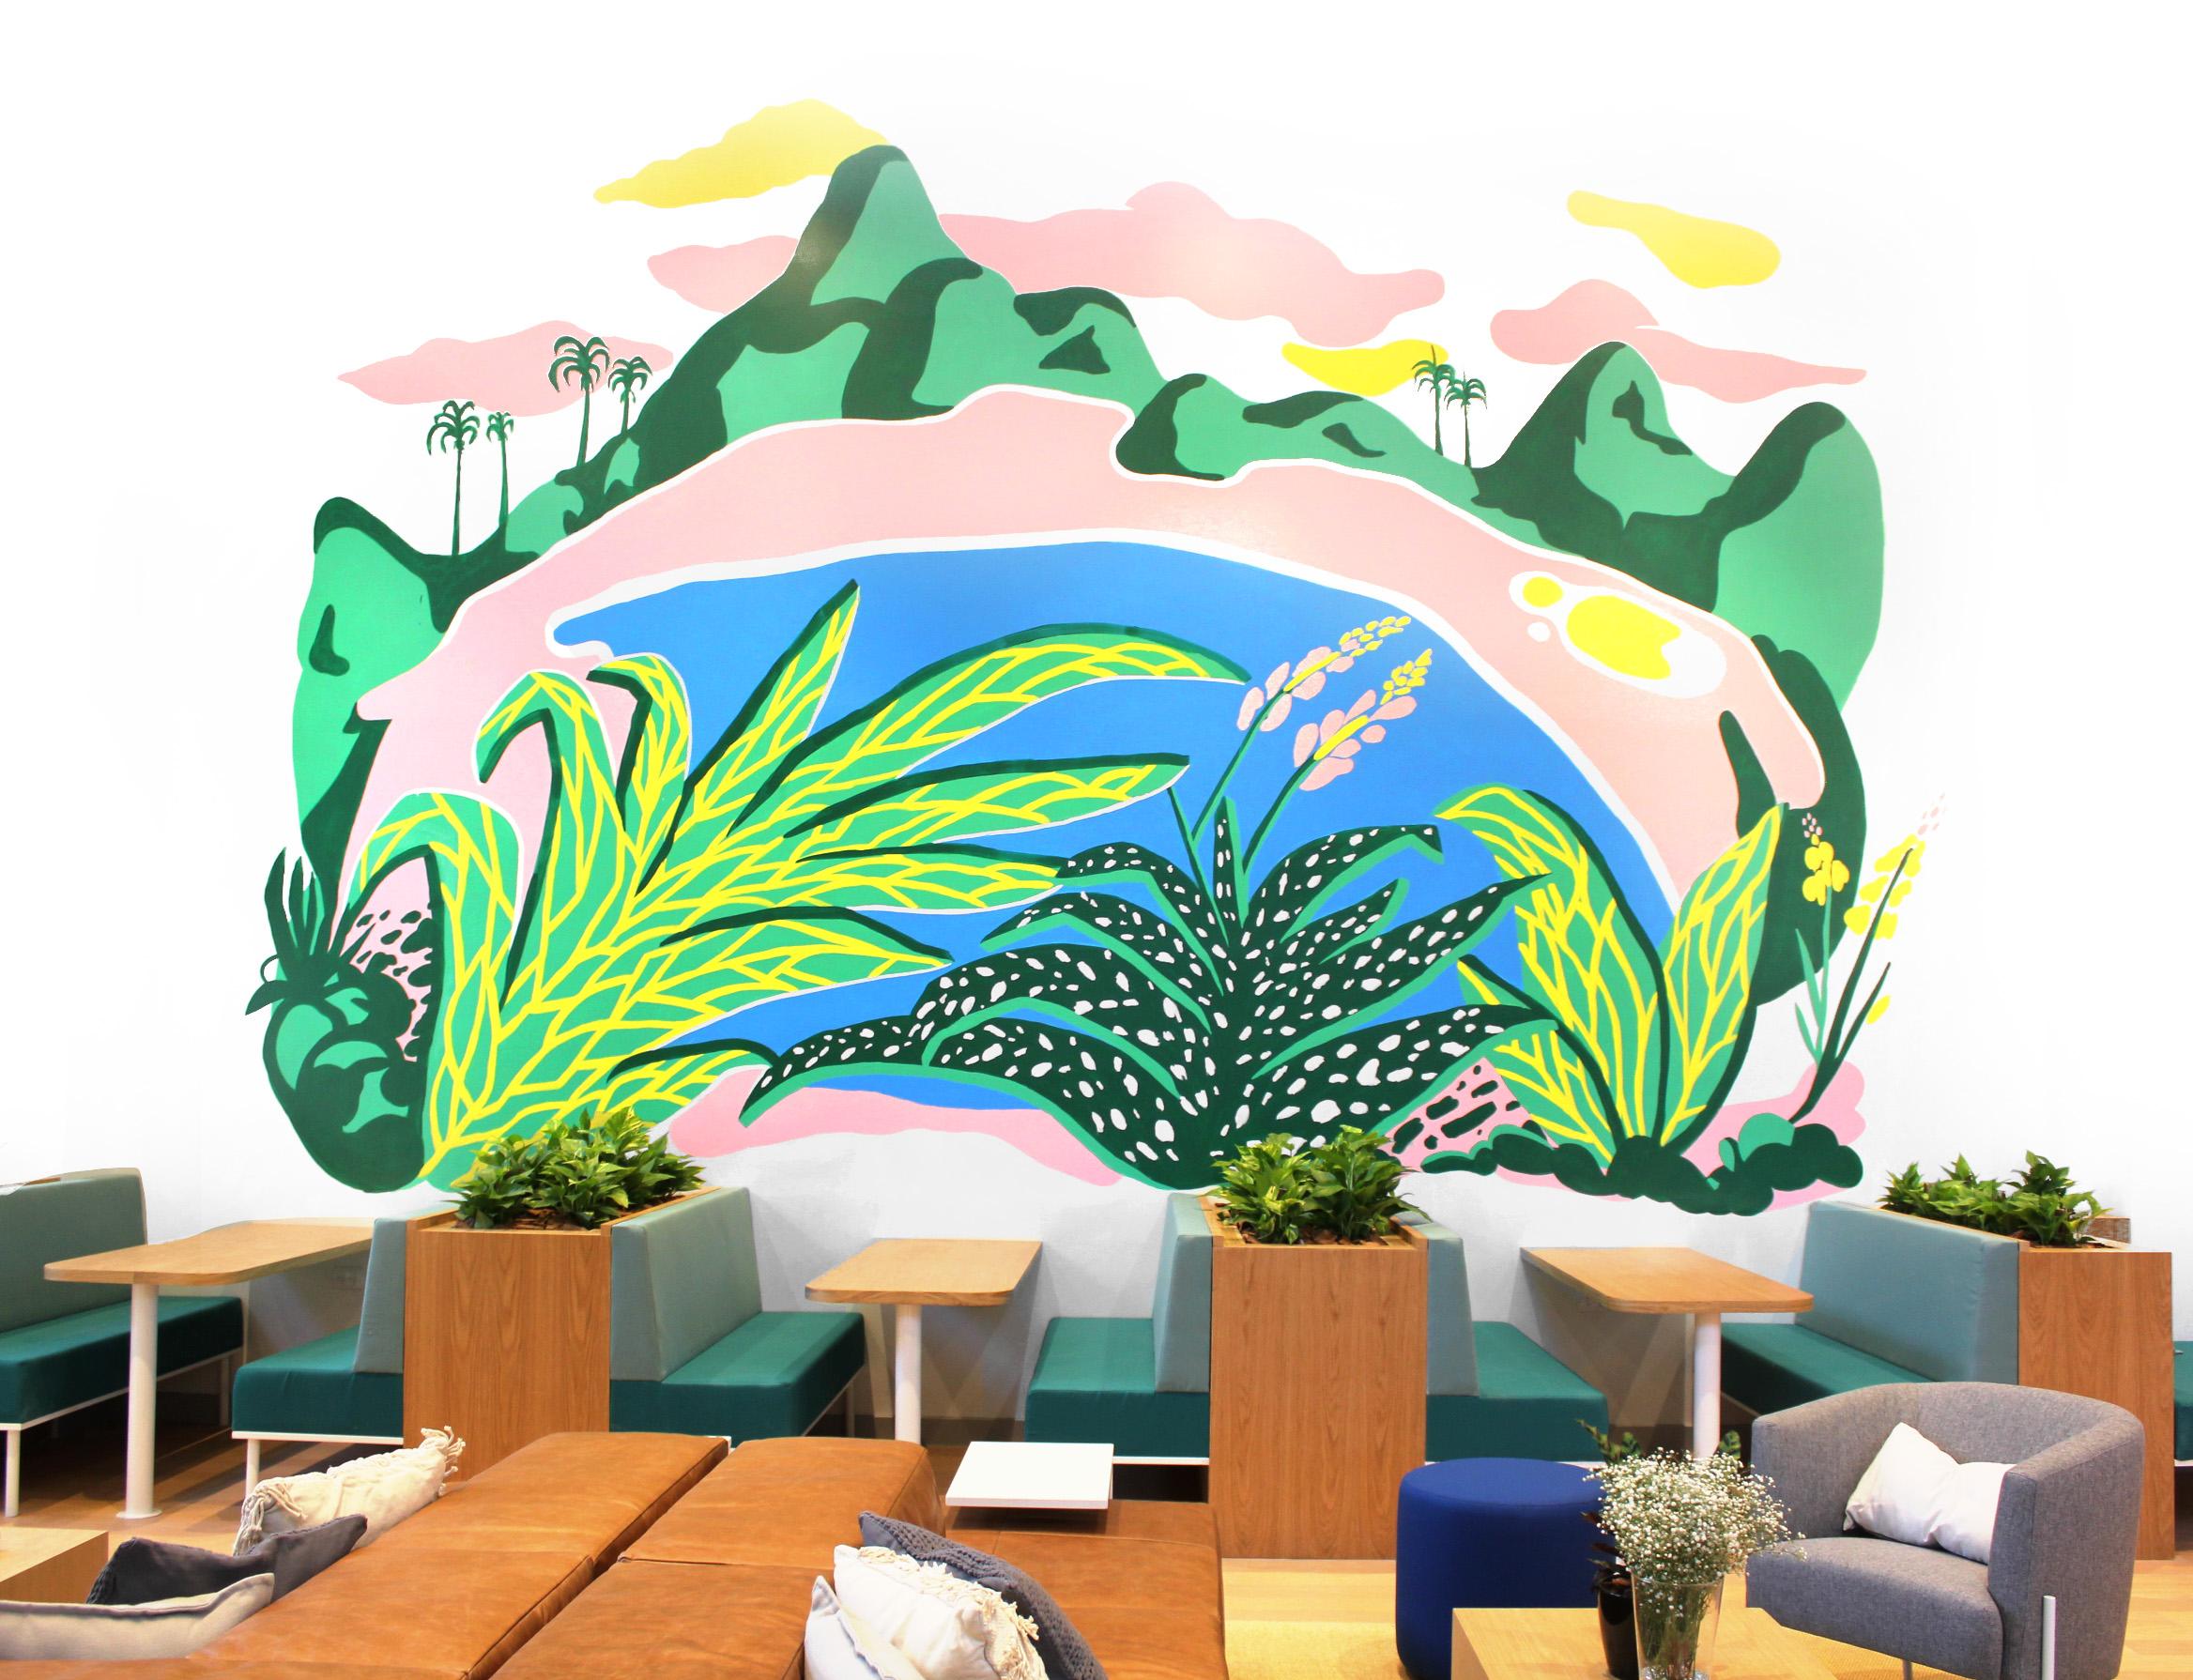 RIO_Seelinger_mural_Eric_Marte_collab_edit.jpg